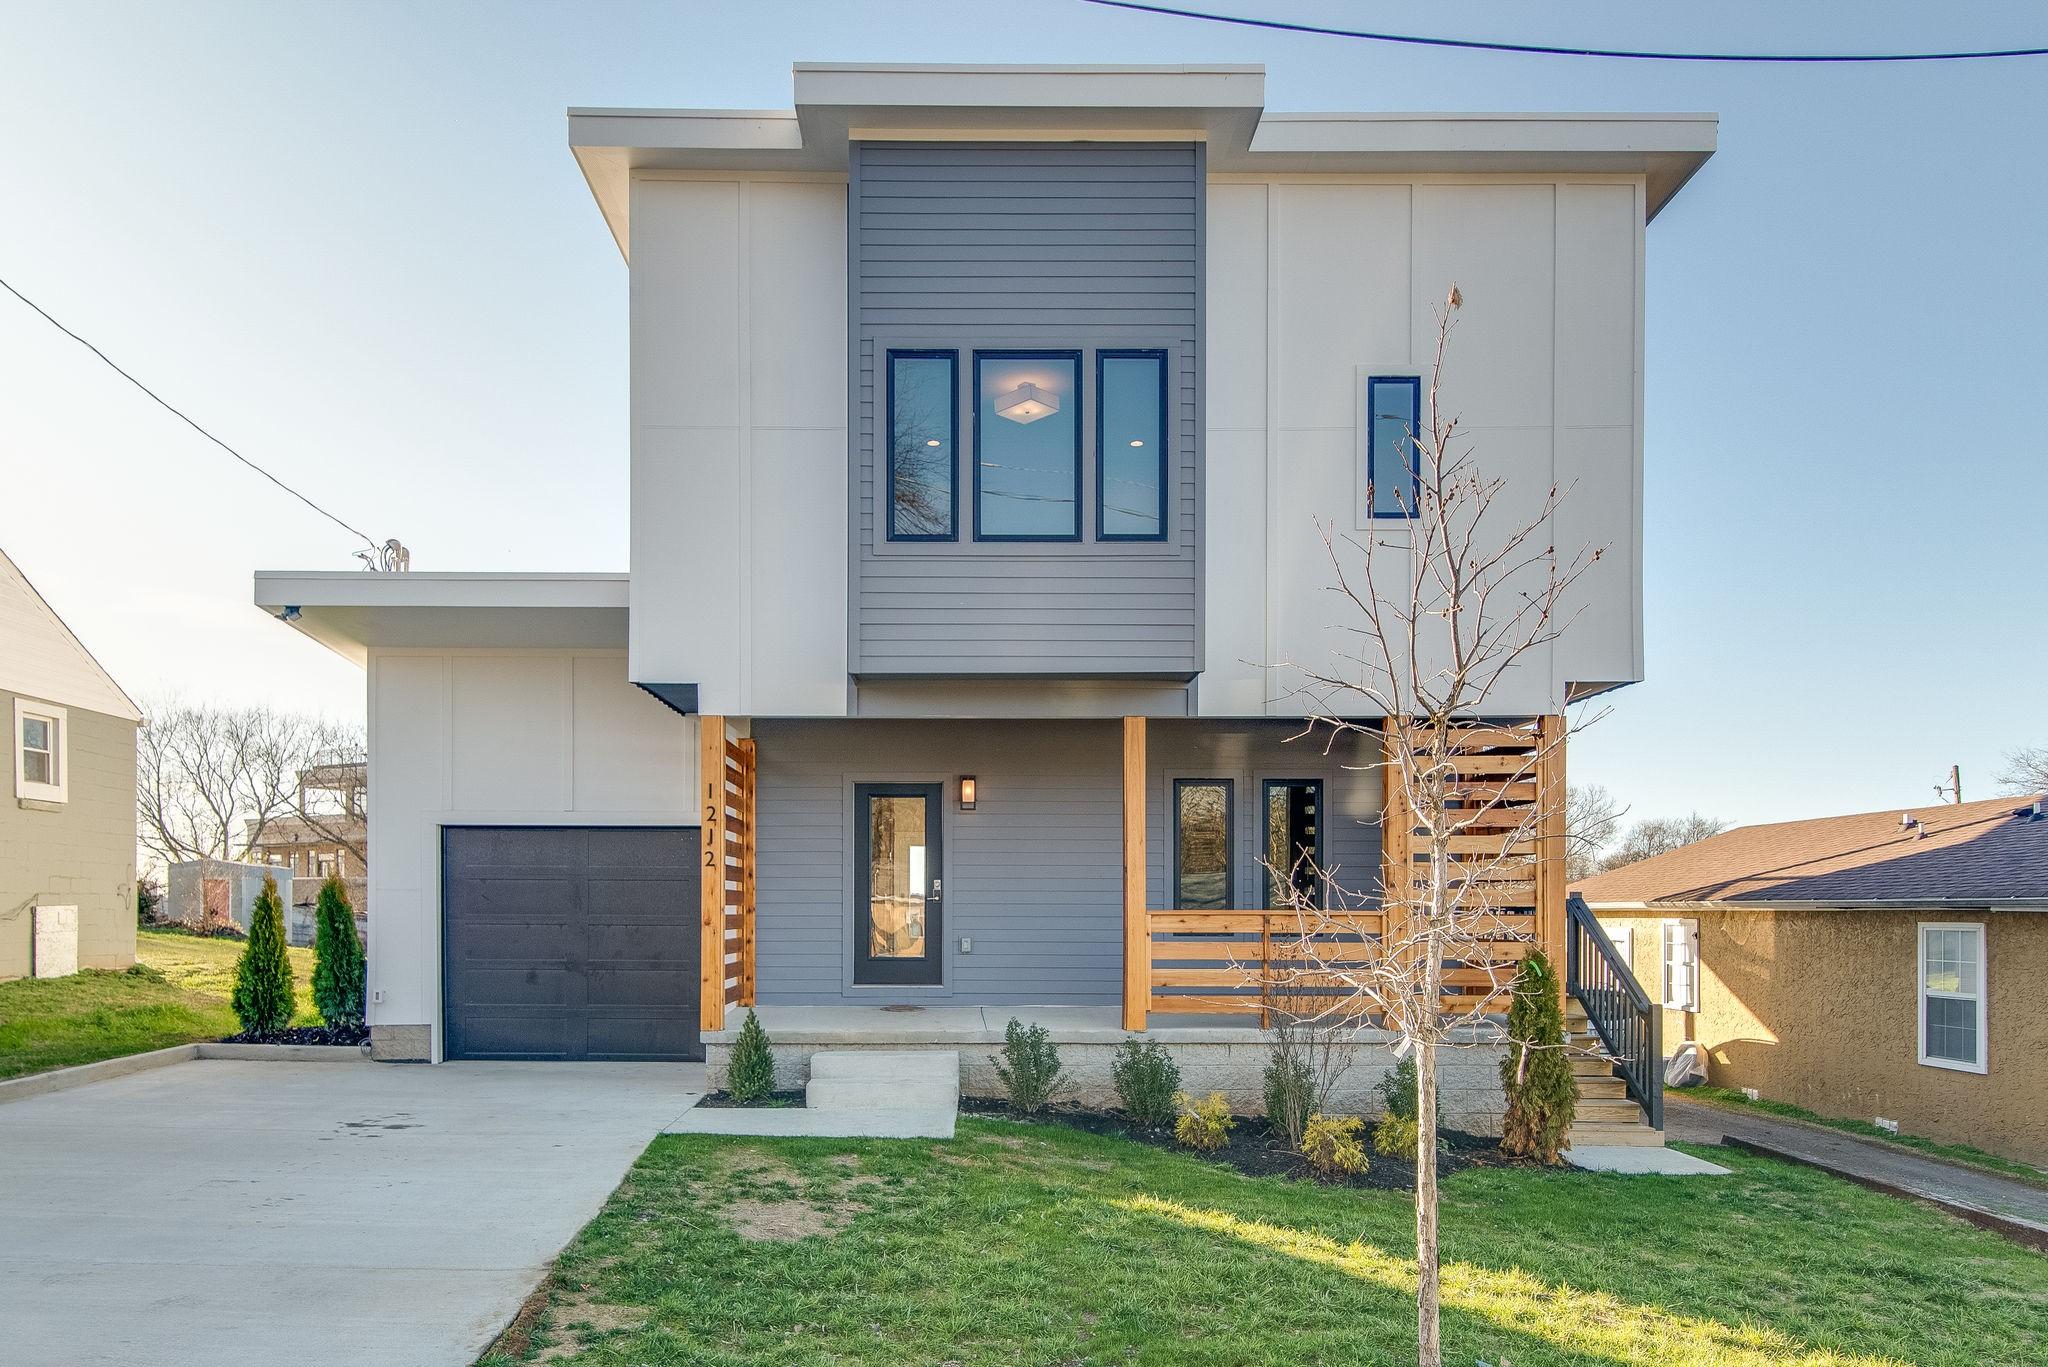 1212 Katie St, Nashville, TN 37207 - Nashville, TN real estate listing